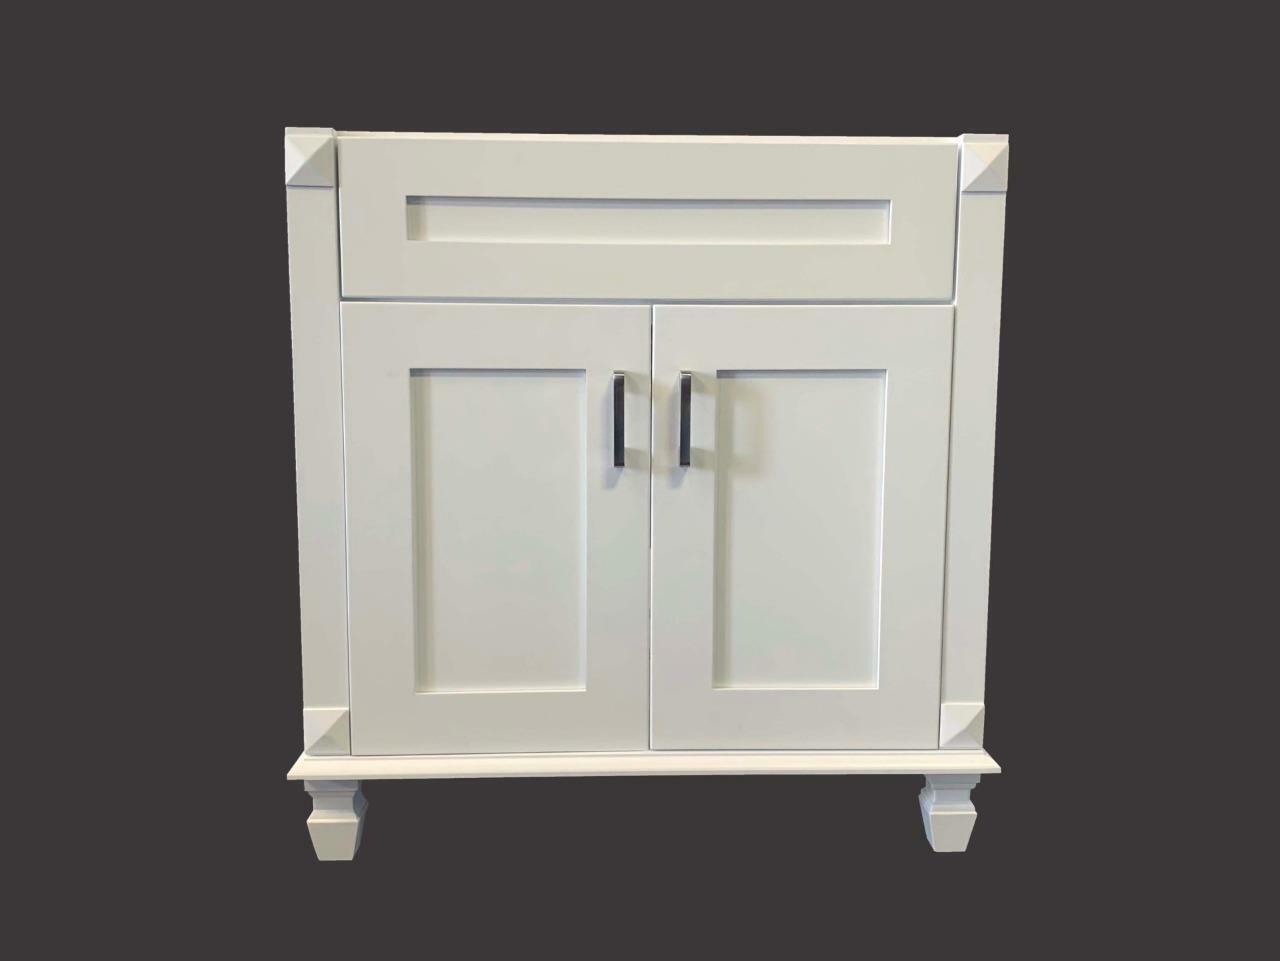 Robern Vd30bcl21 30 Inch W Single Drawer Deep Vanity In White For Sale Online Ebay